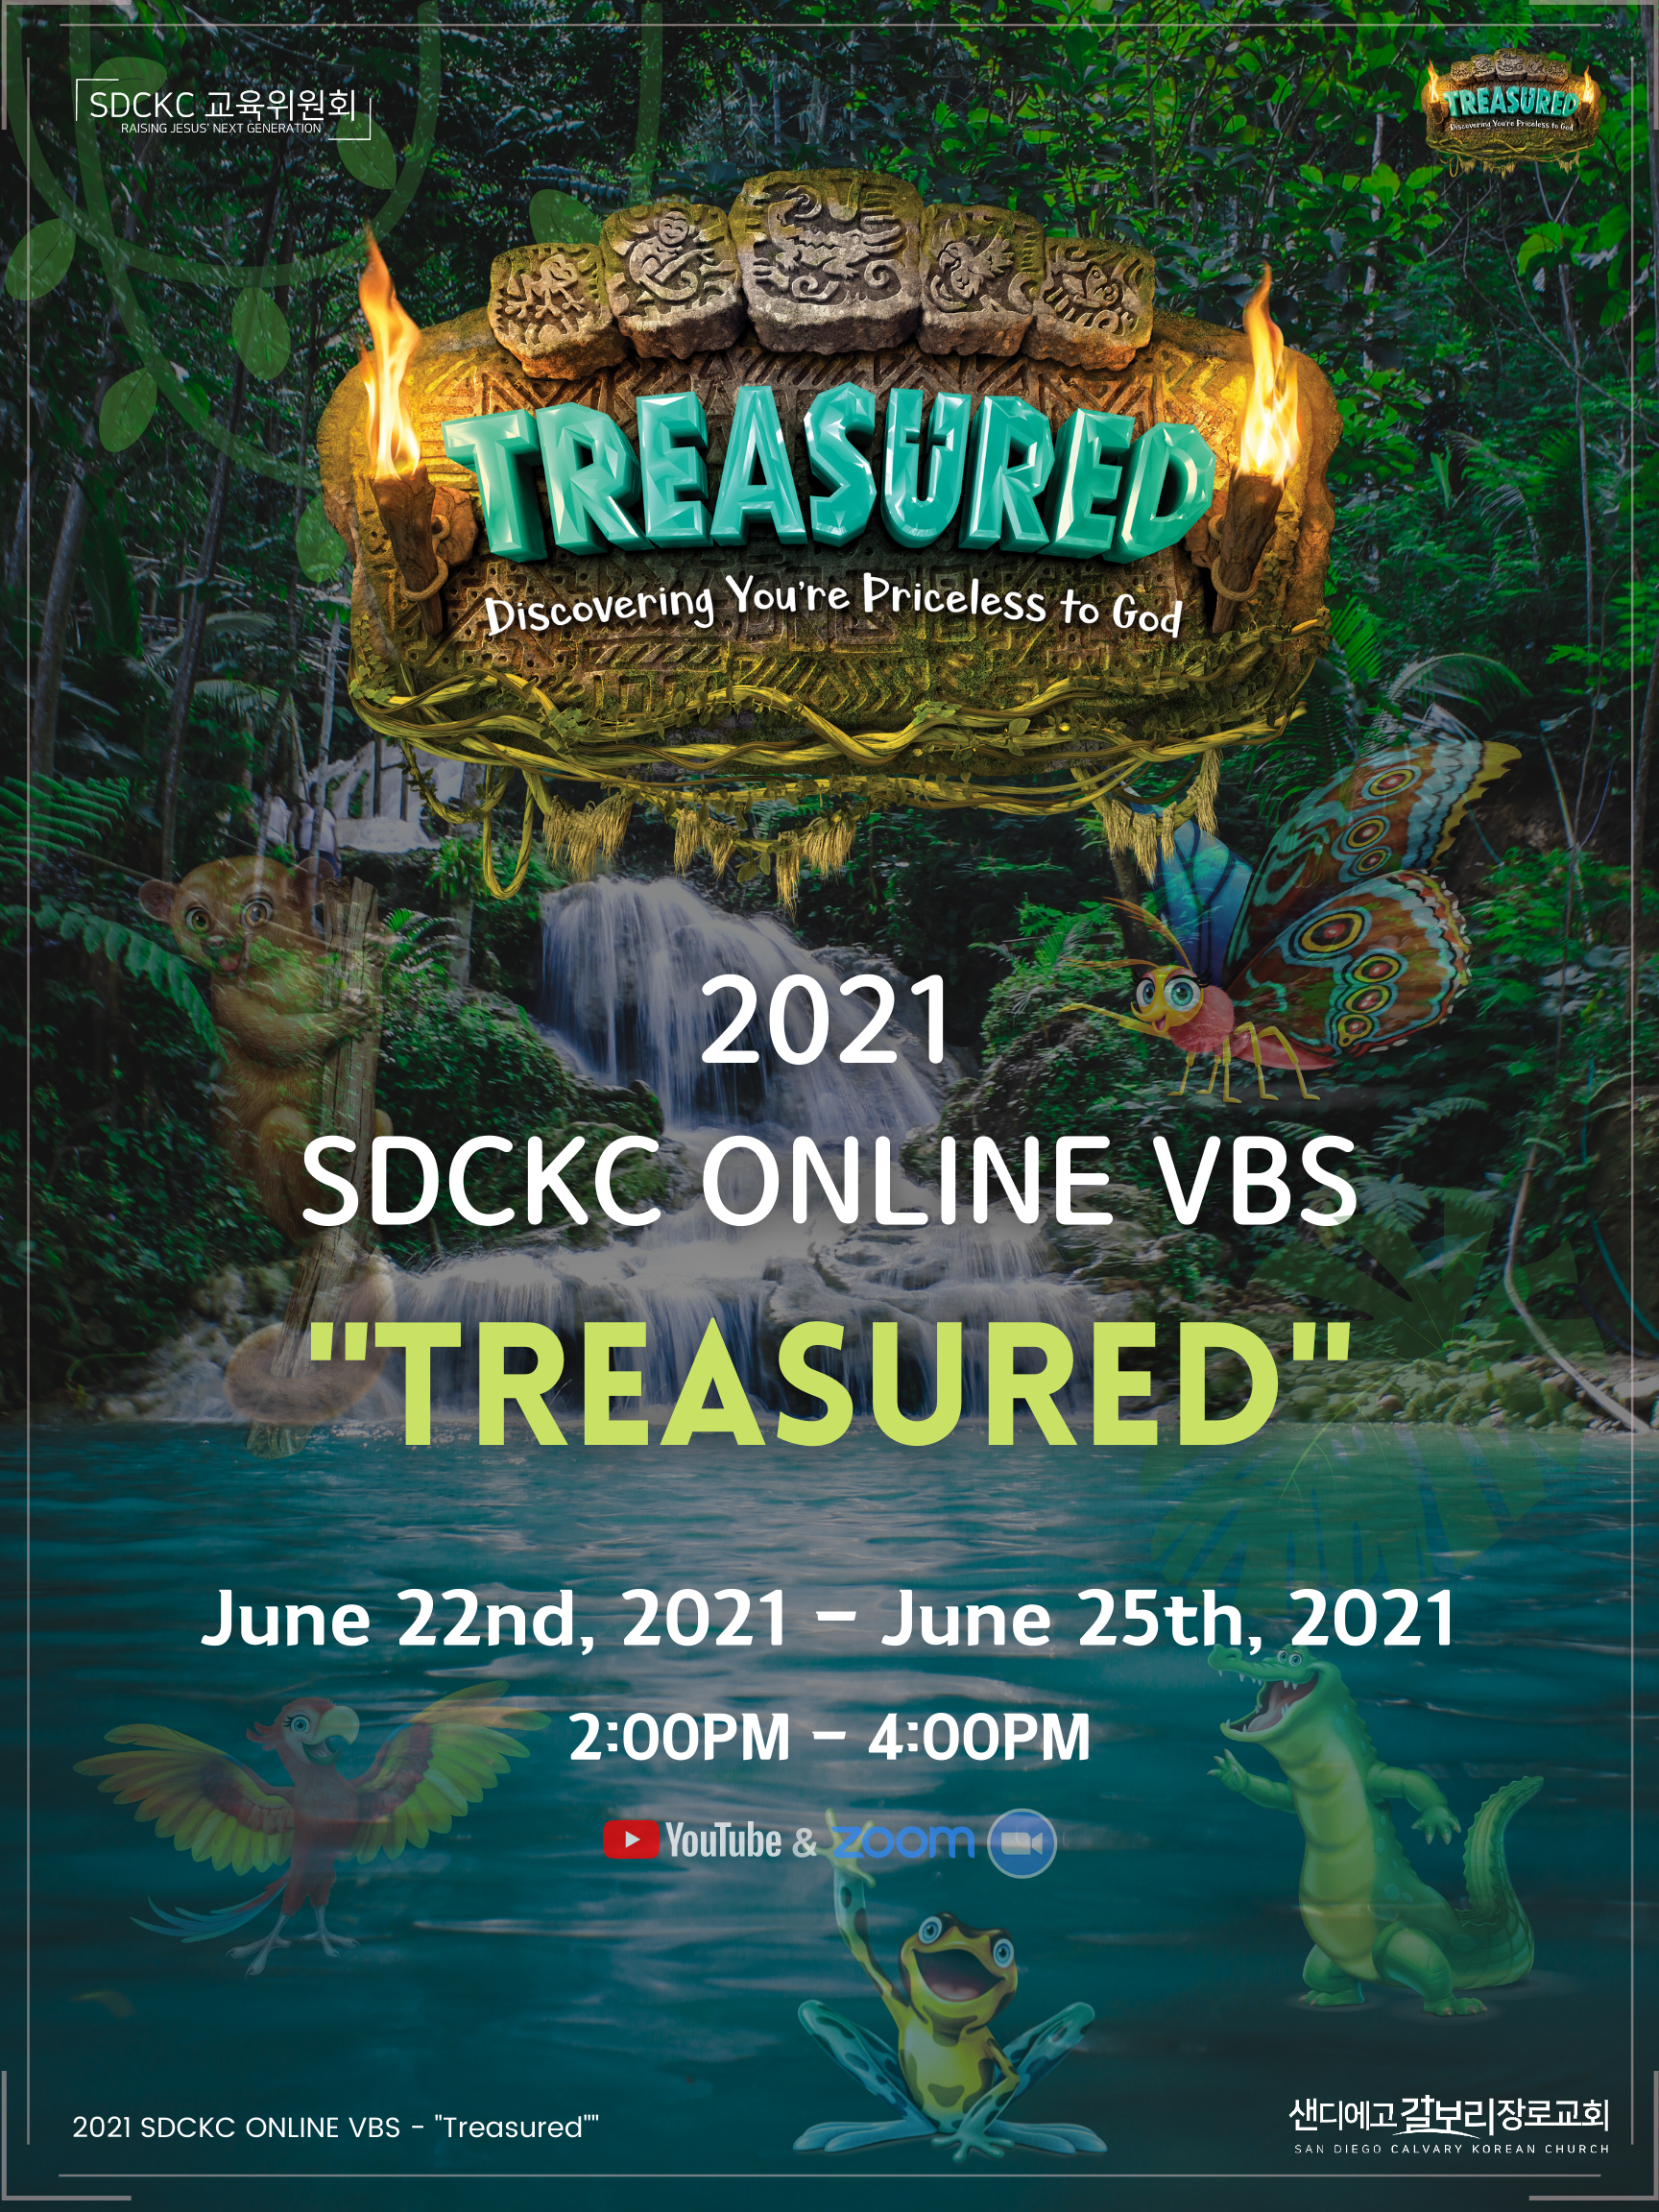 2021 SDCKC ONLINE VBS - Treasured Poster 1st.png